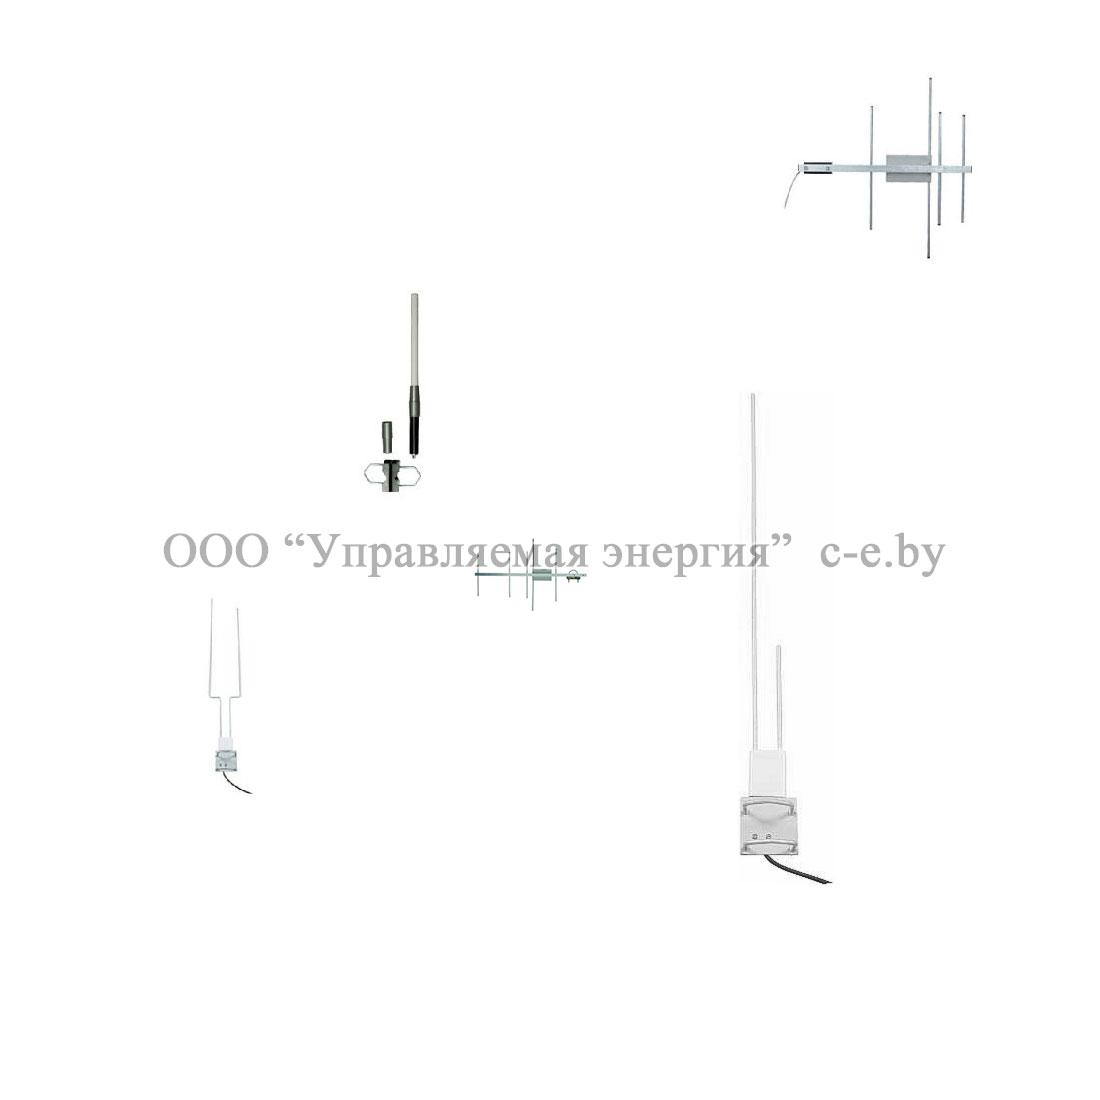 Антенны для передачи данных по радиоканалу